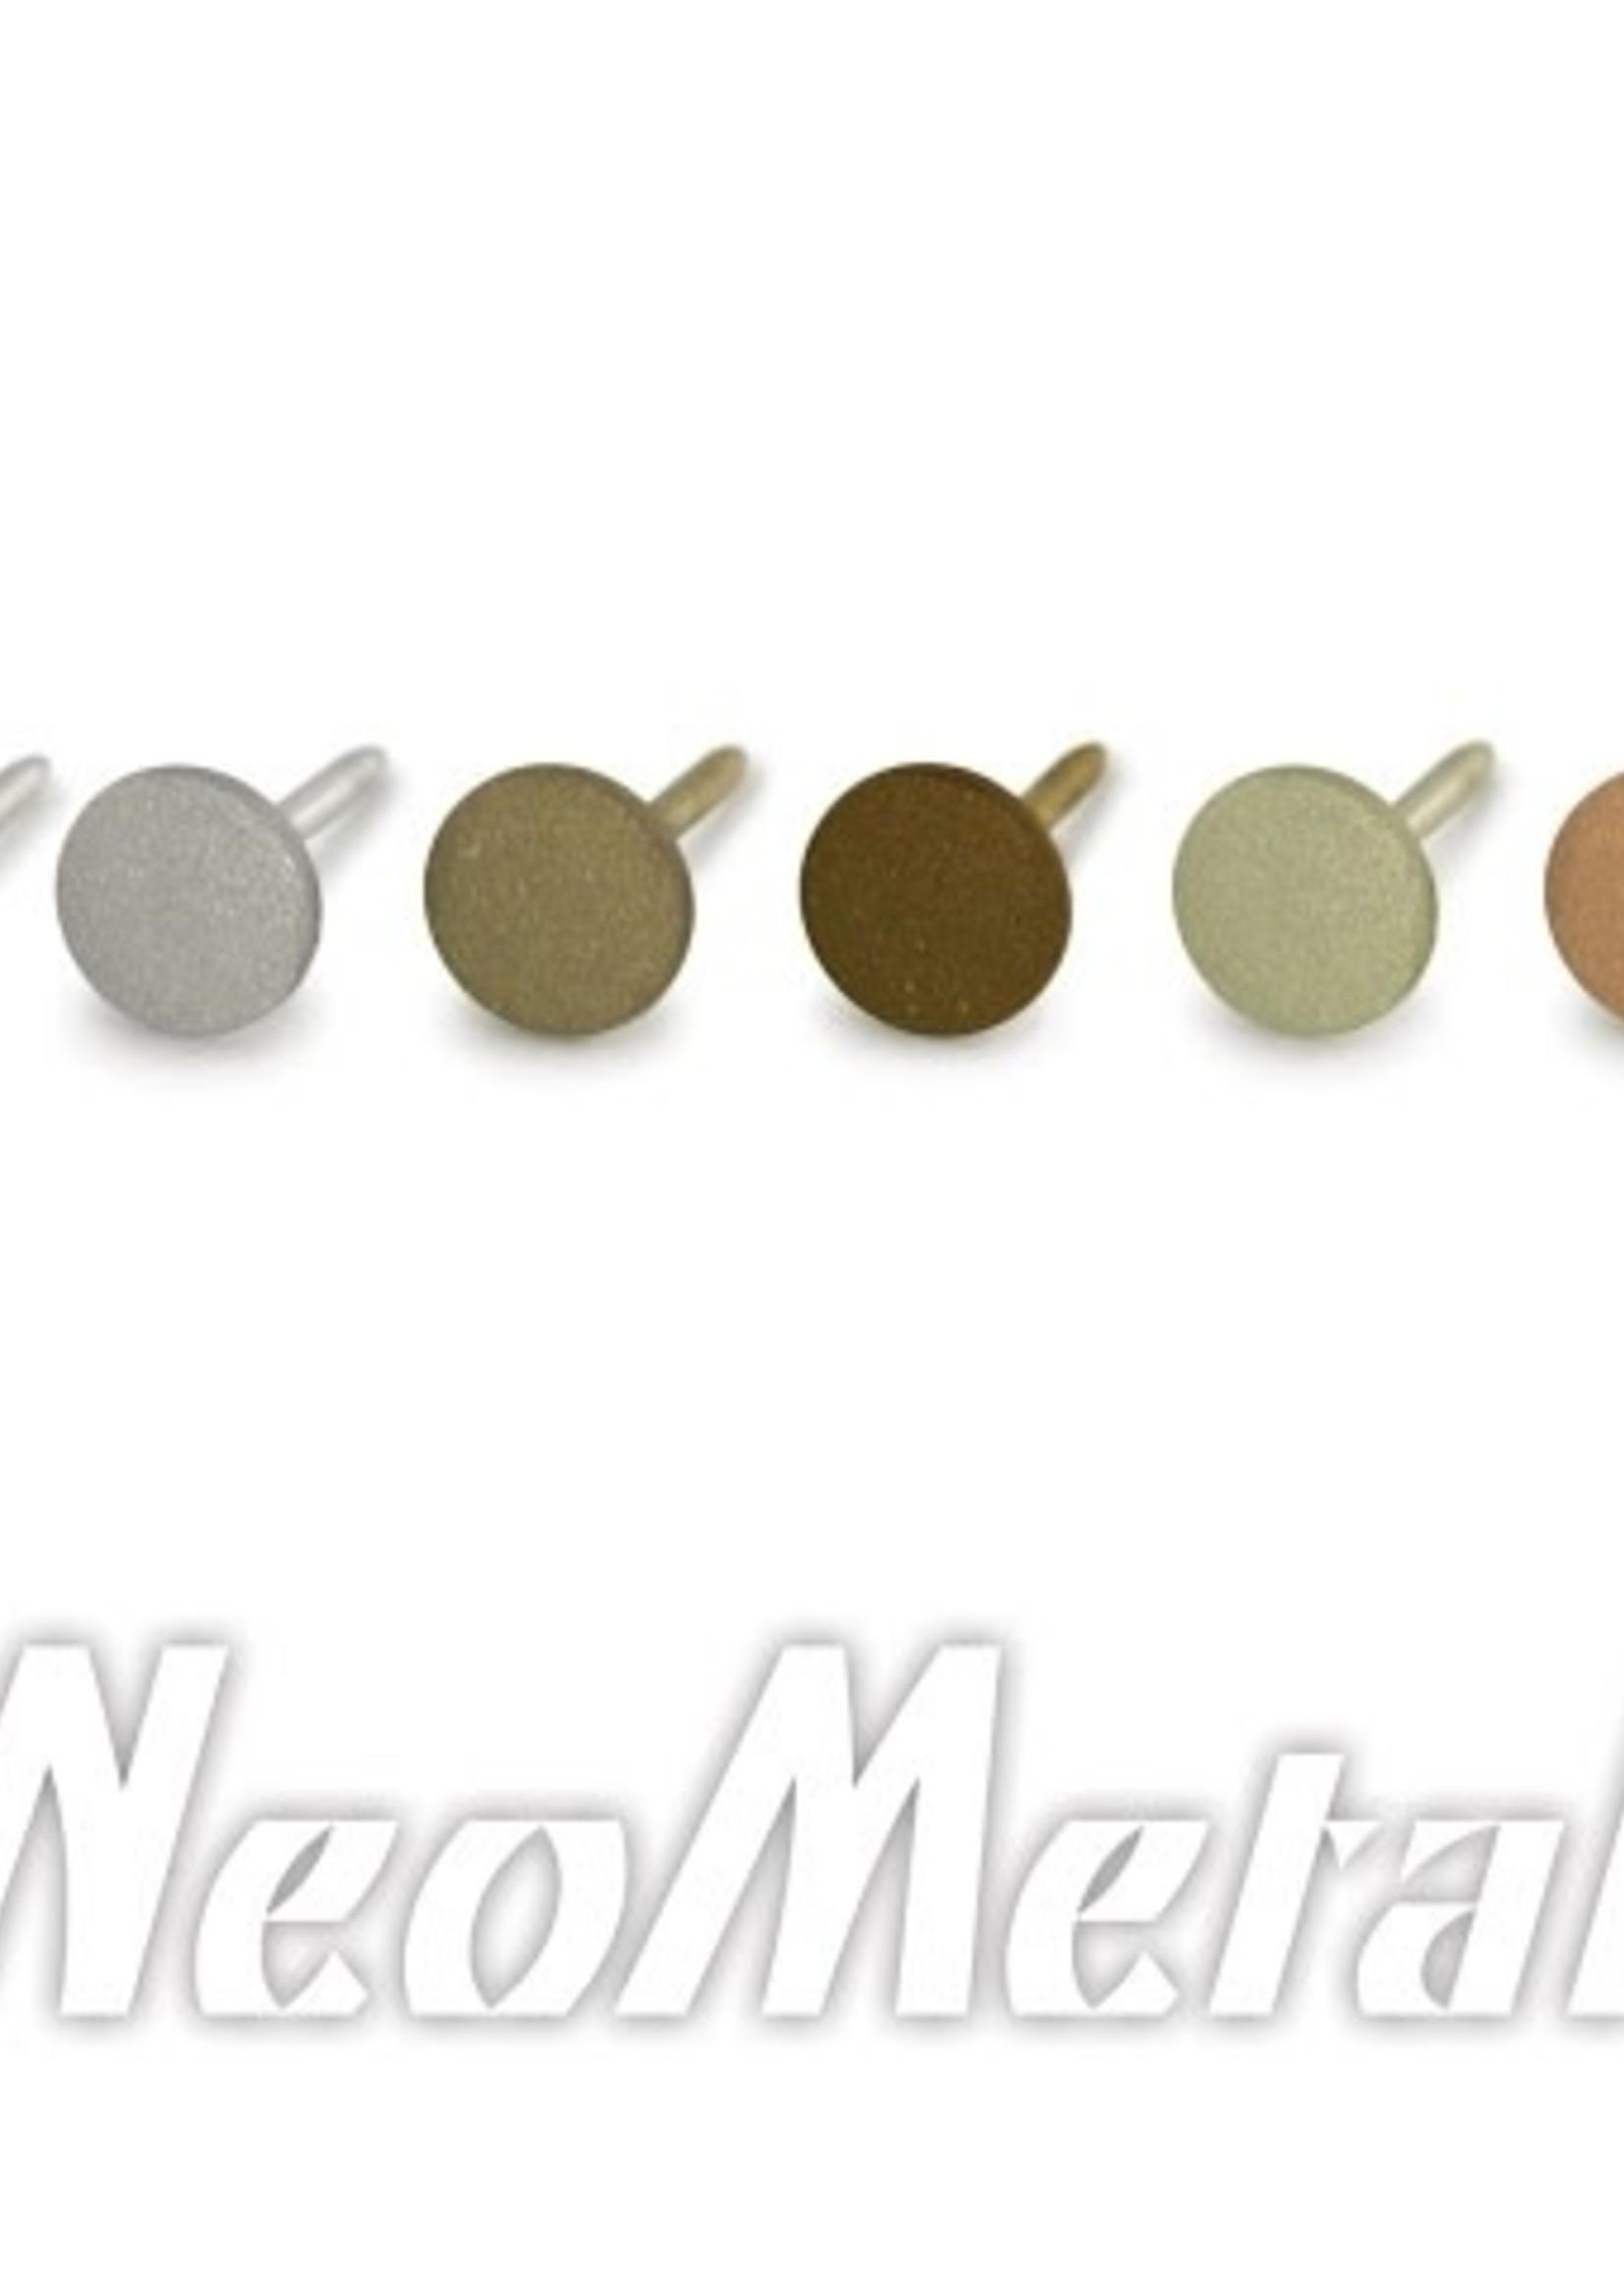 XRT Skin Tone Textured Disk